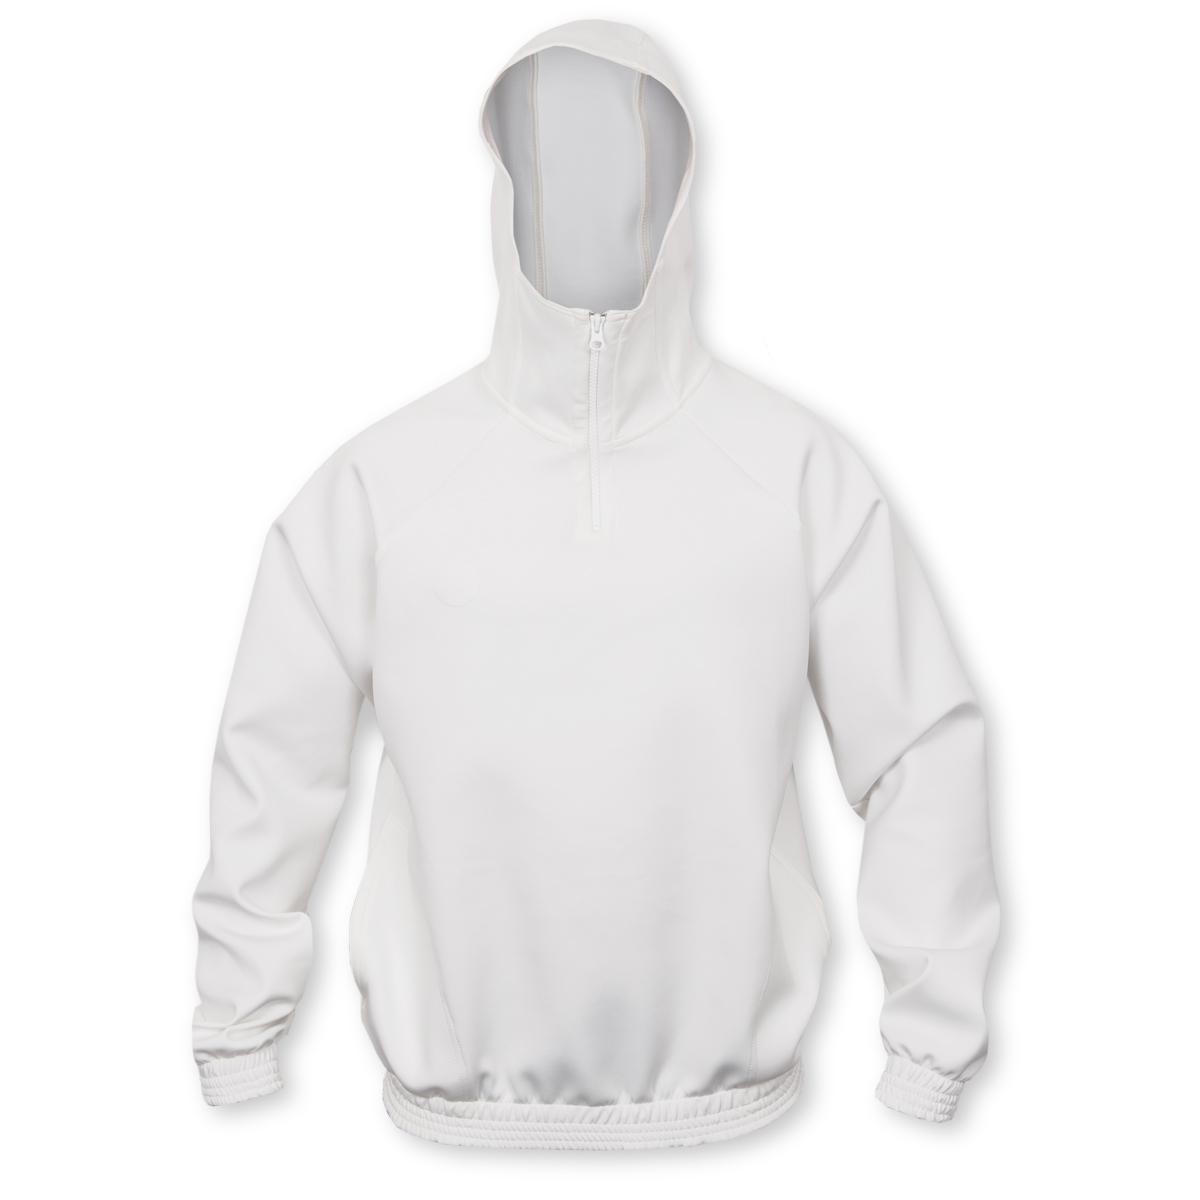 Blusa Anorak Neoprene - Branco